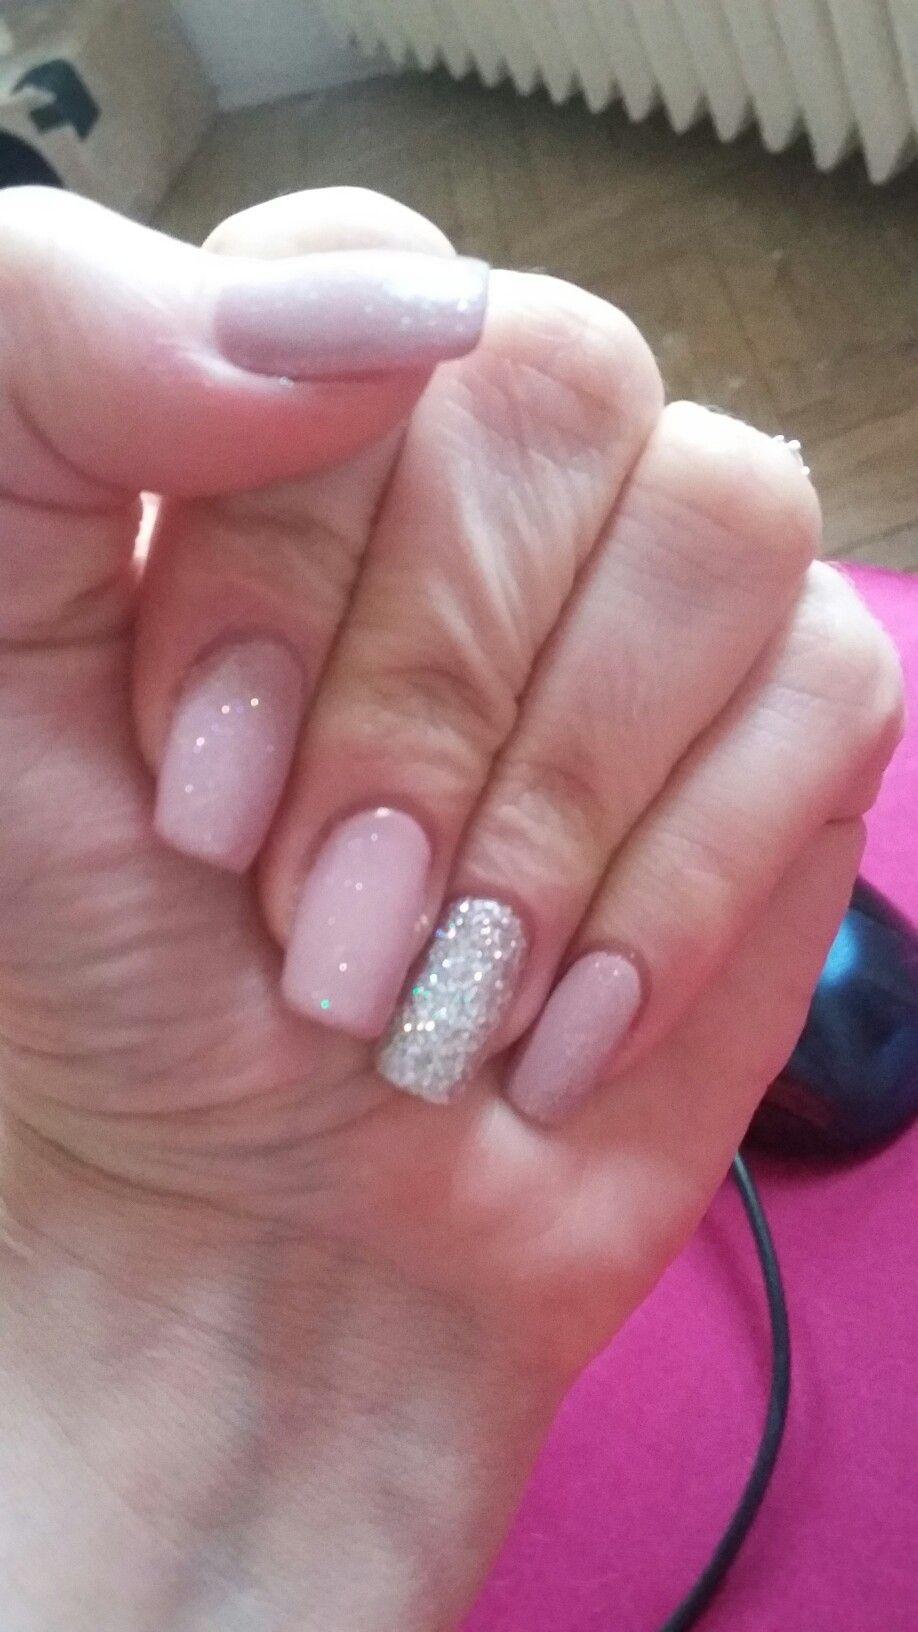 Ny new romantic nails | Nails | Pinterest | Romantic nails